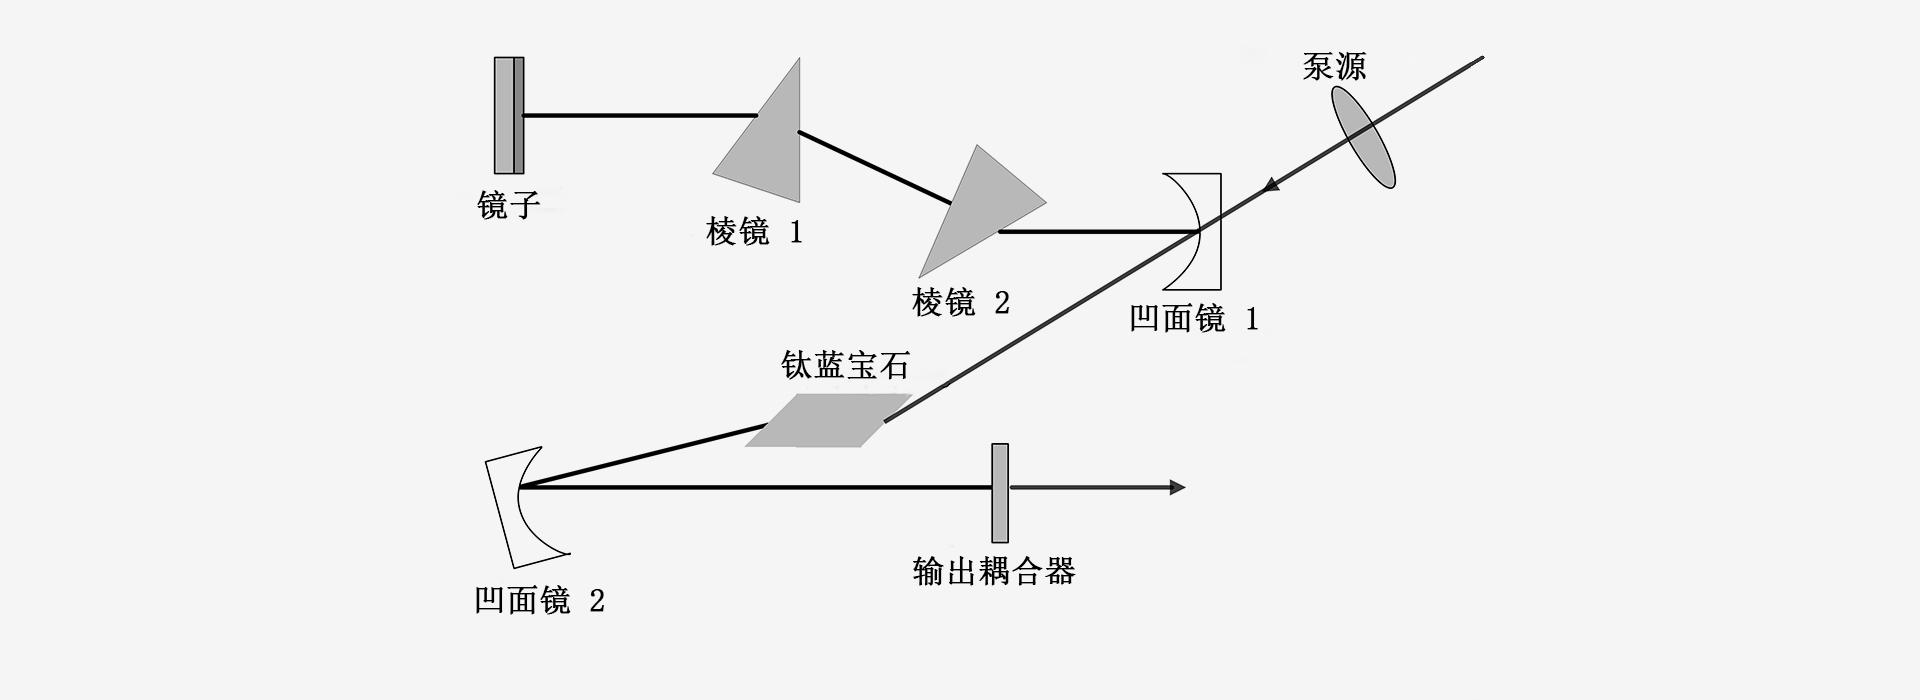 800nm-激光器原理图-南京光宝-CRYLINK-原理图